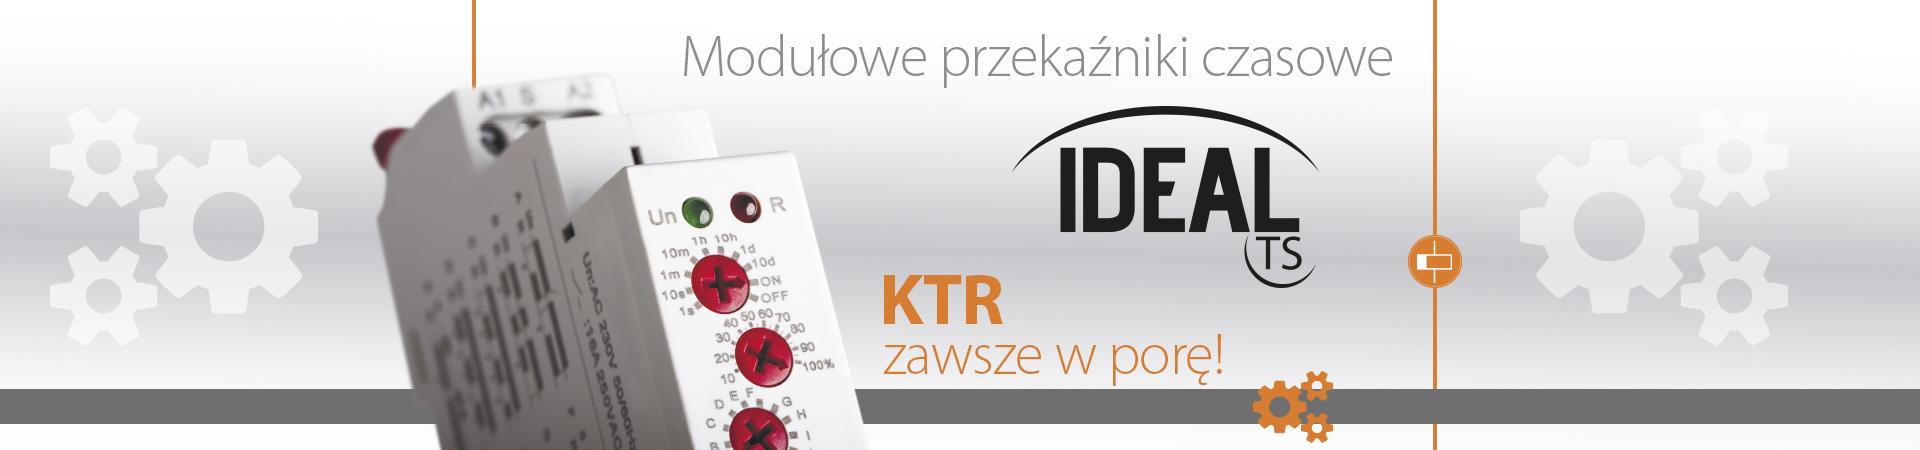 Misja specjalna film polski online dating 5